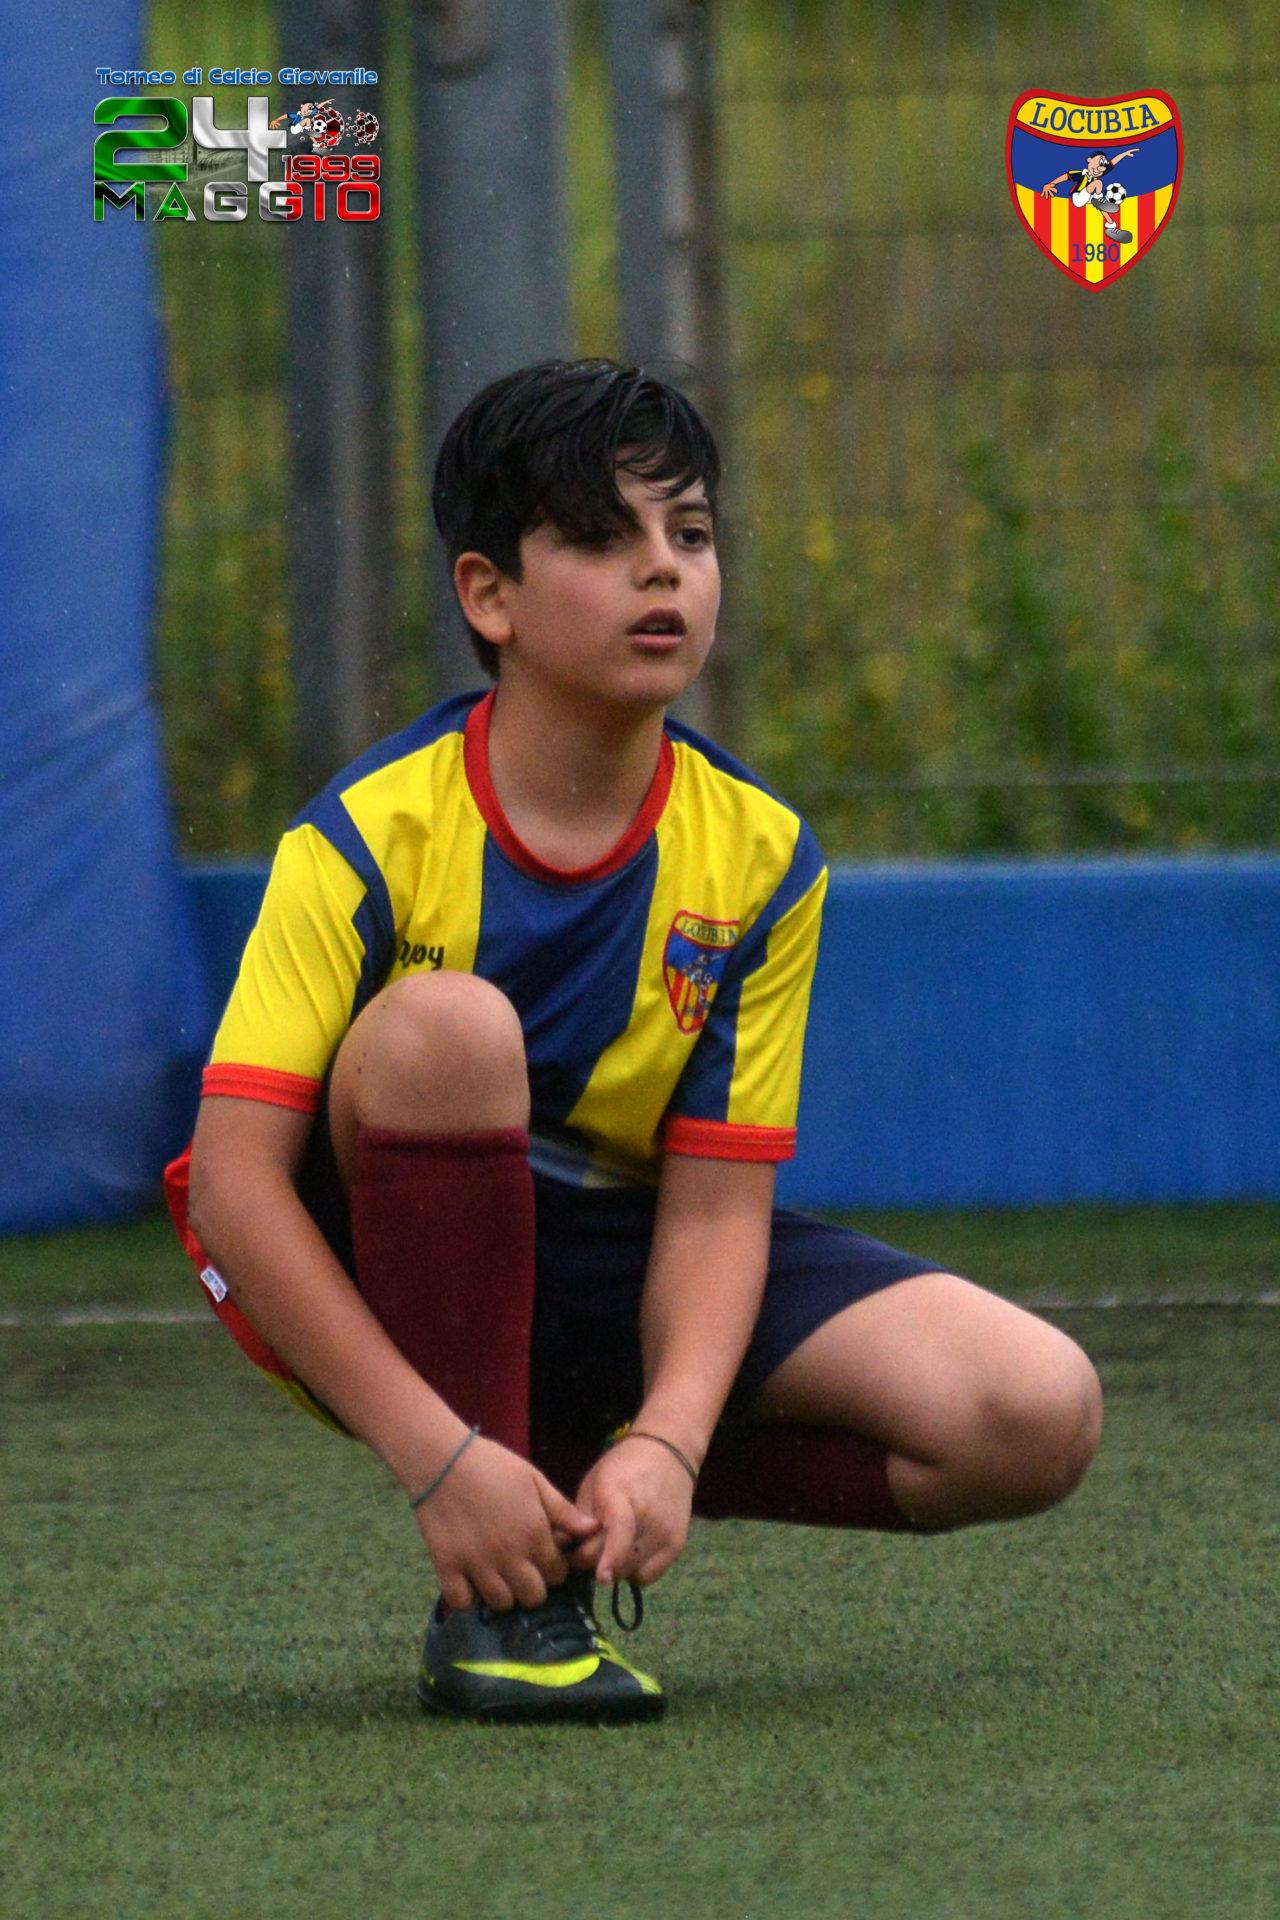 Fvy7gy6b 7 Polisportiva Locubia Blog 5 Di Pagina wPkiOXTZu